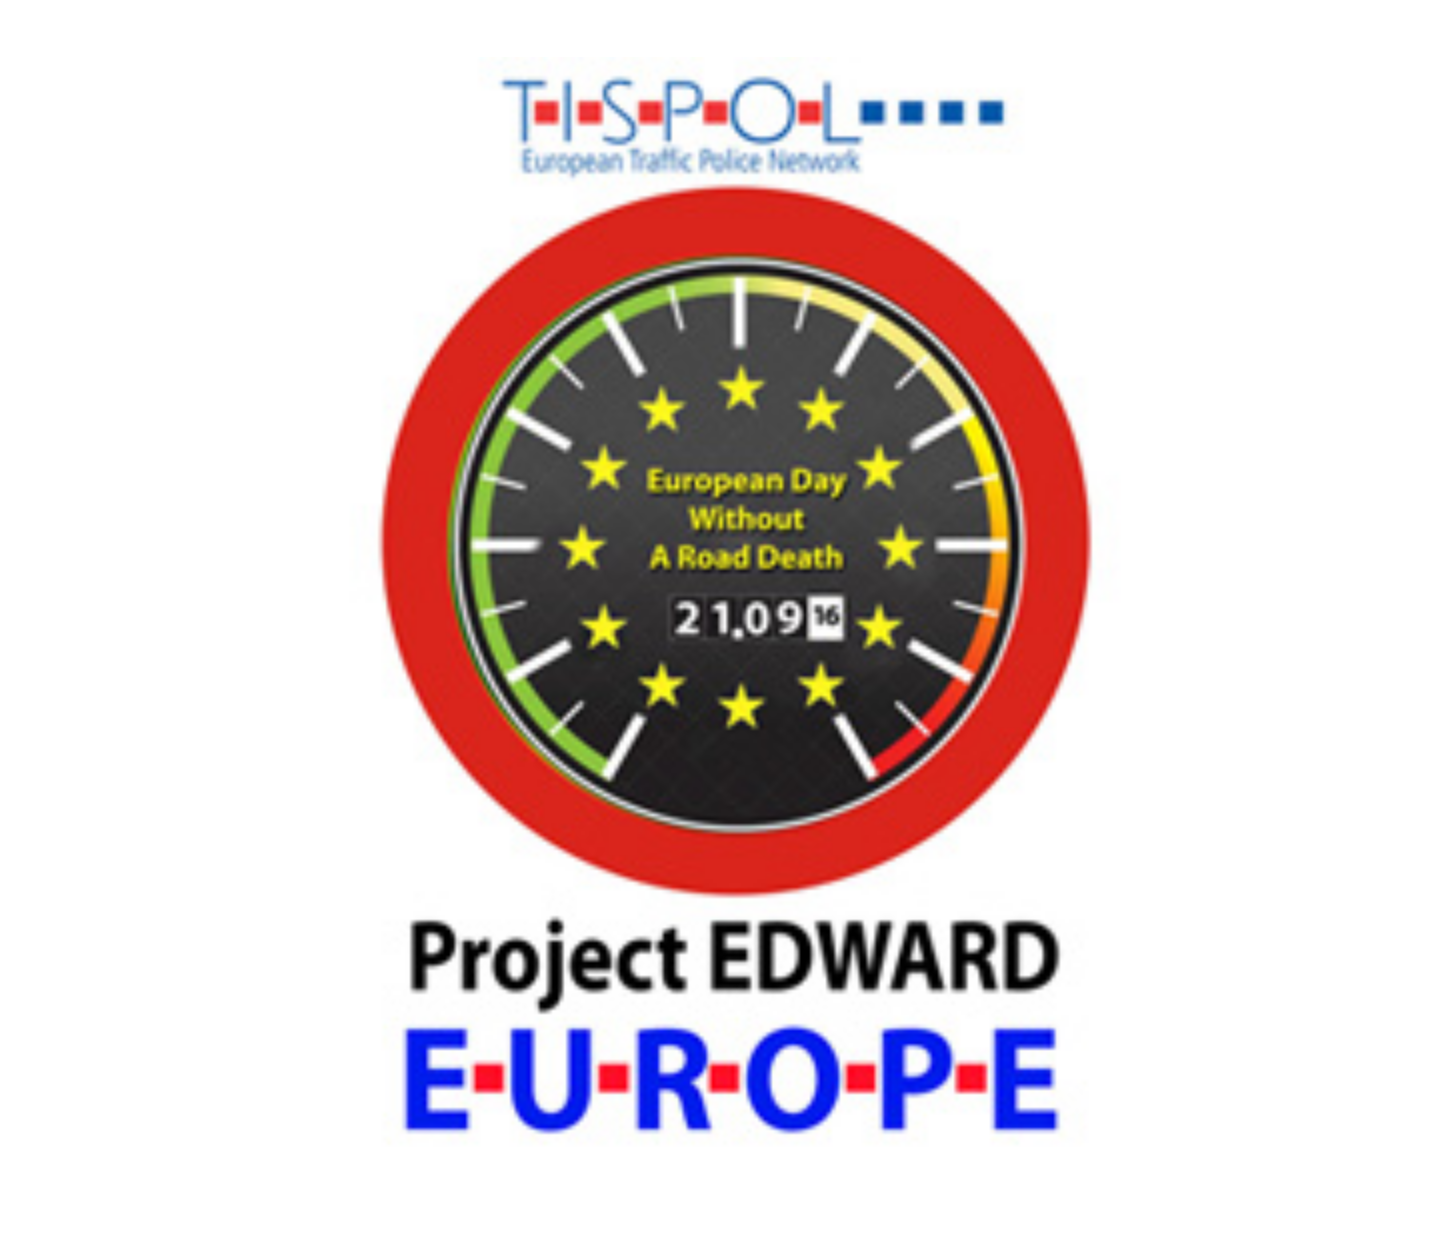 LOGO PROJECT EDWARD 2016